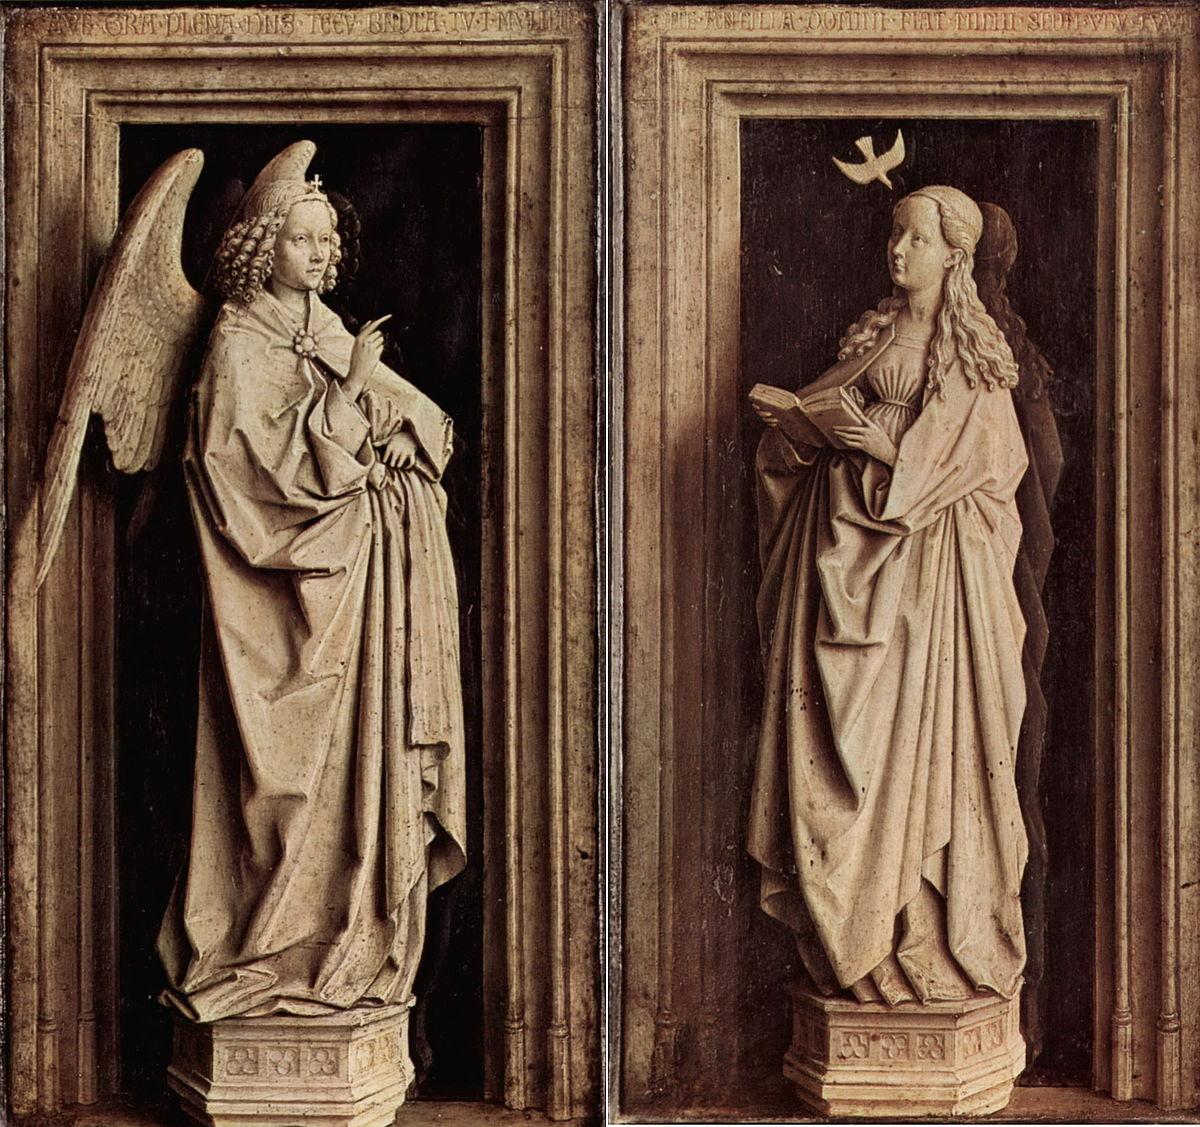 annunciation van eyck madrid wikipedia